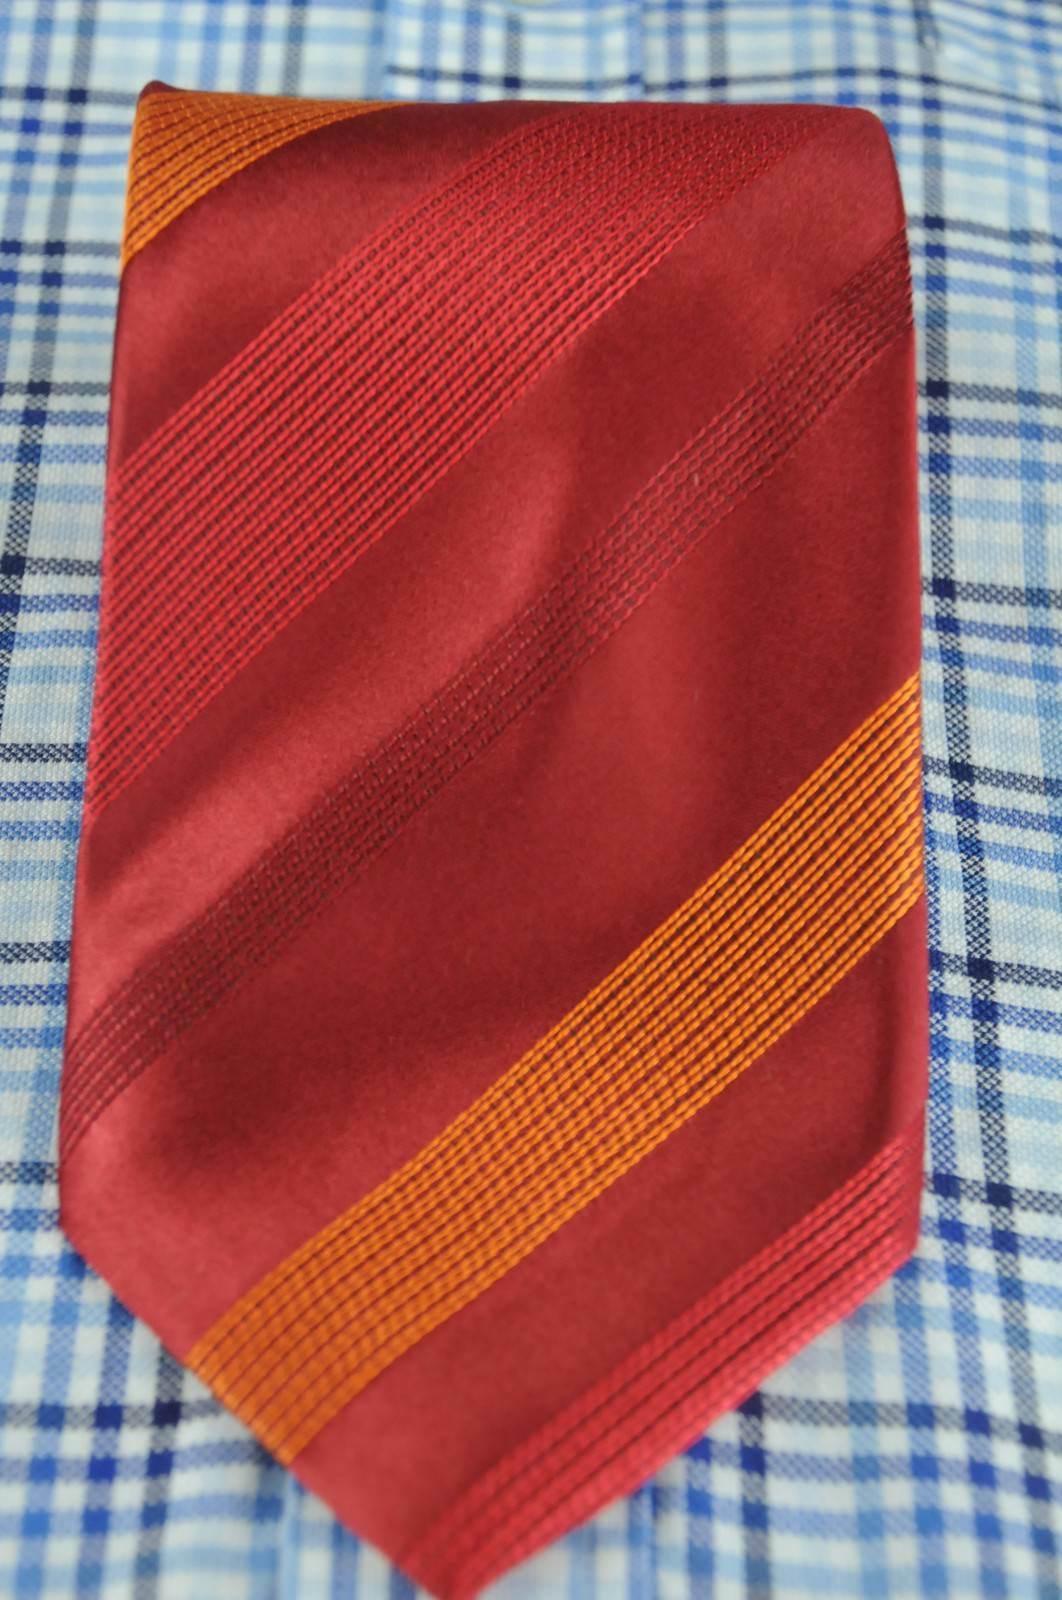 Kenneth Cole Men's Tie Ruby & Orange Striped Woven Silk Necktie 60 x 3.5 in. image 2